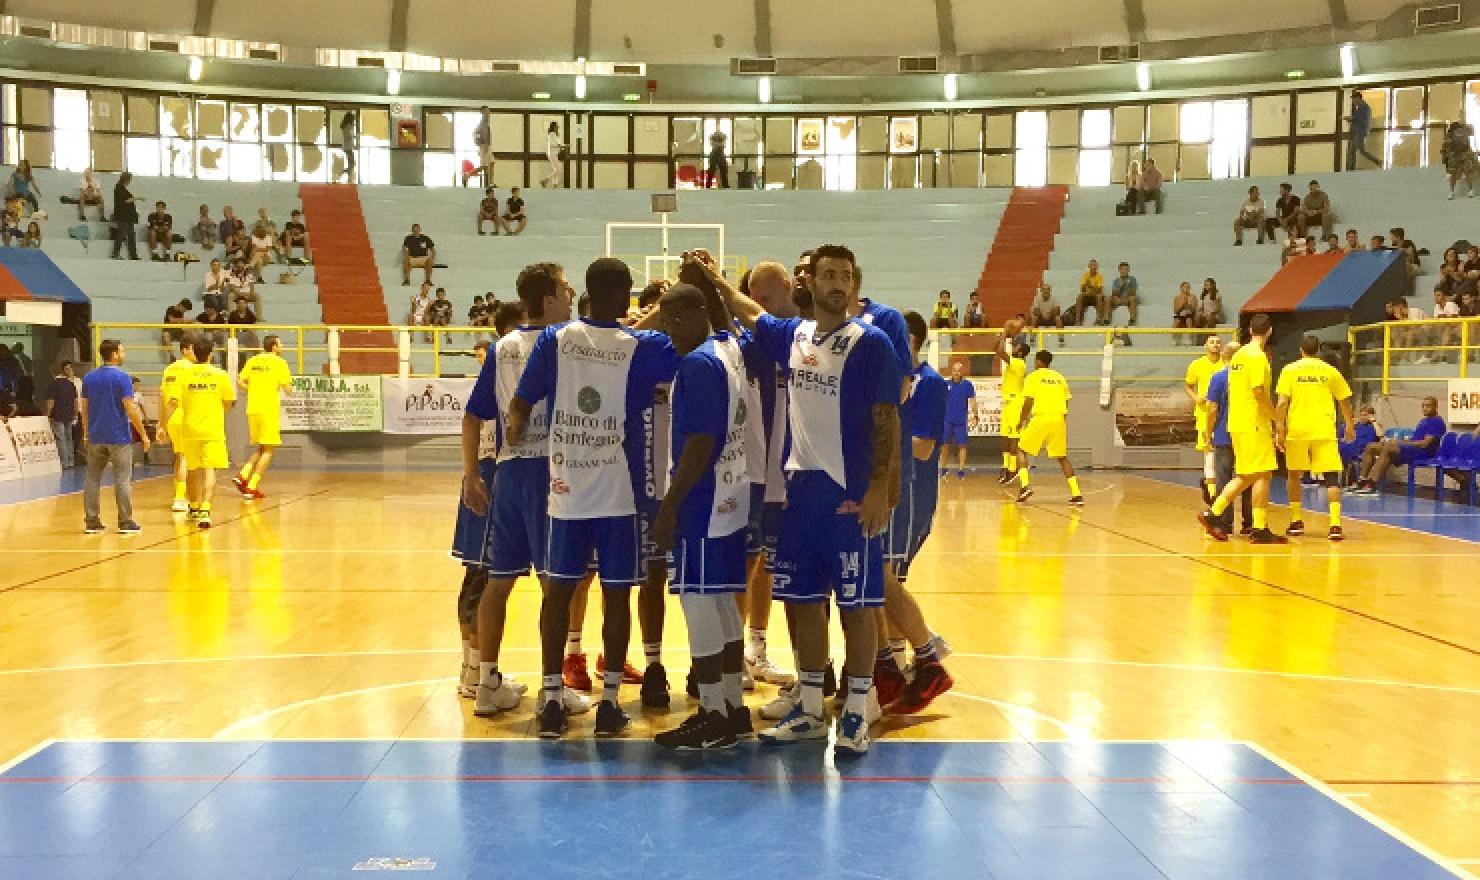 Calendario Legabasket.Legabasket Modifiche Del Calendario Dinamo Sassari